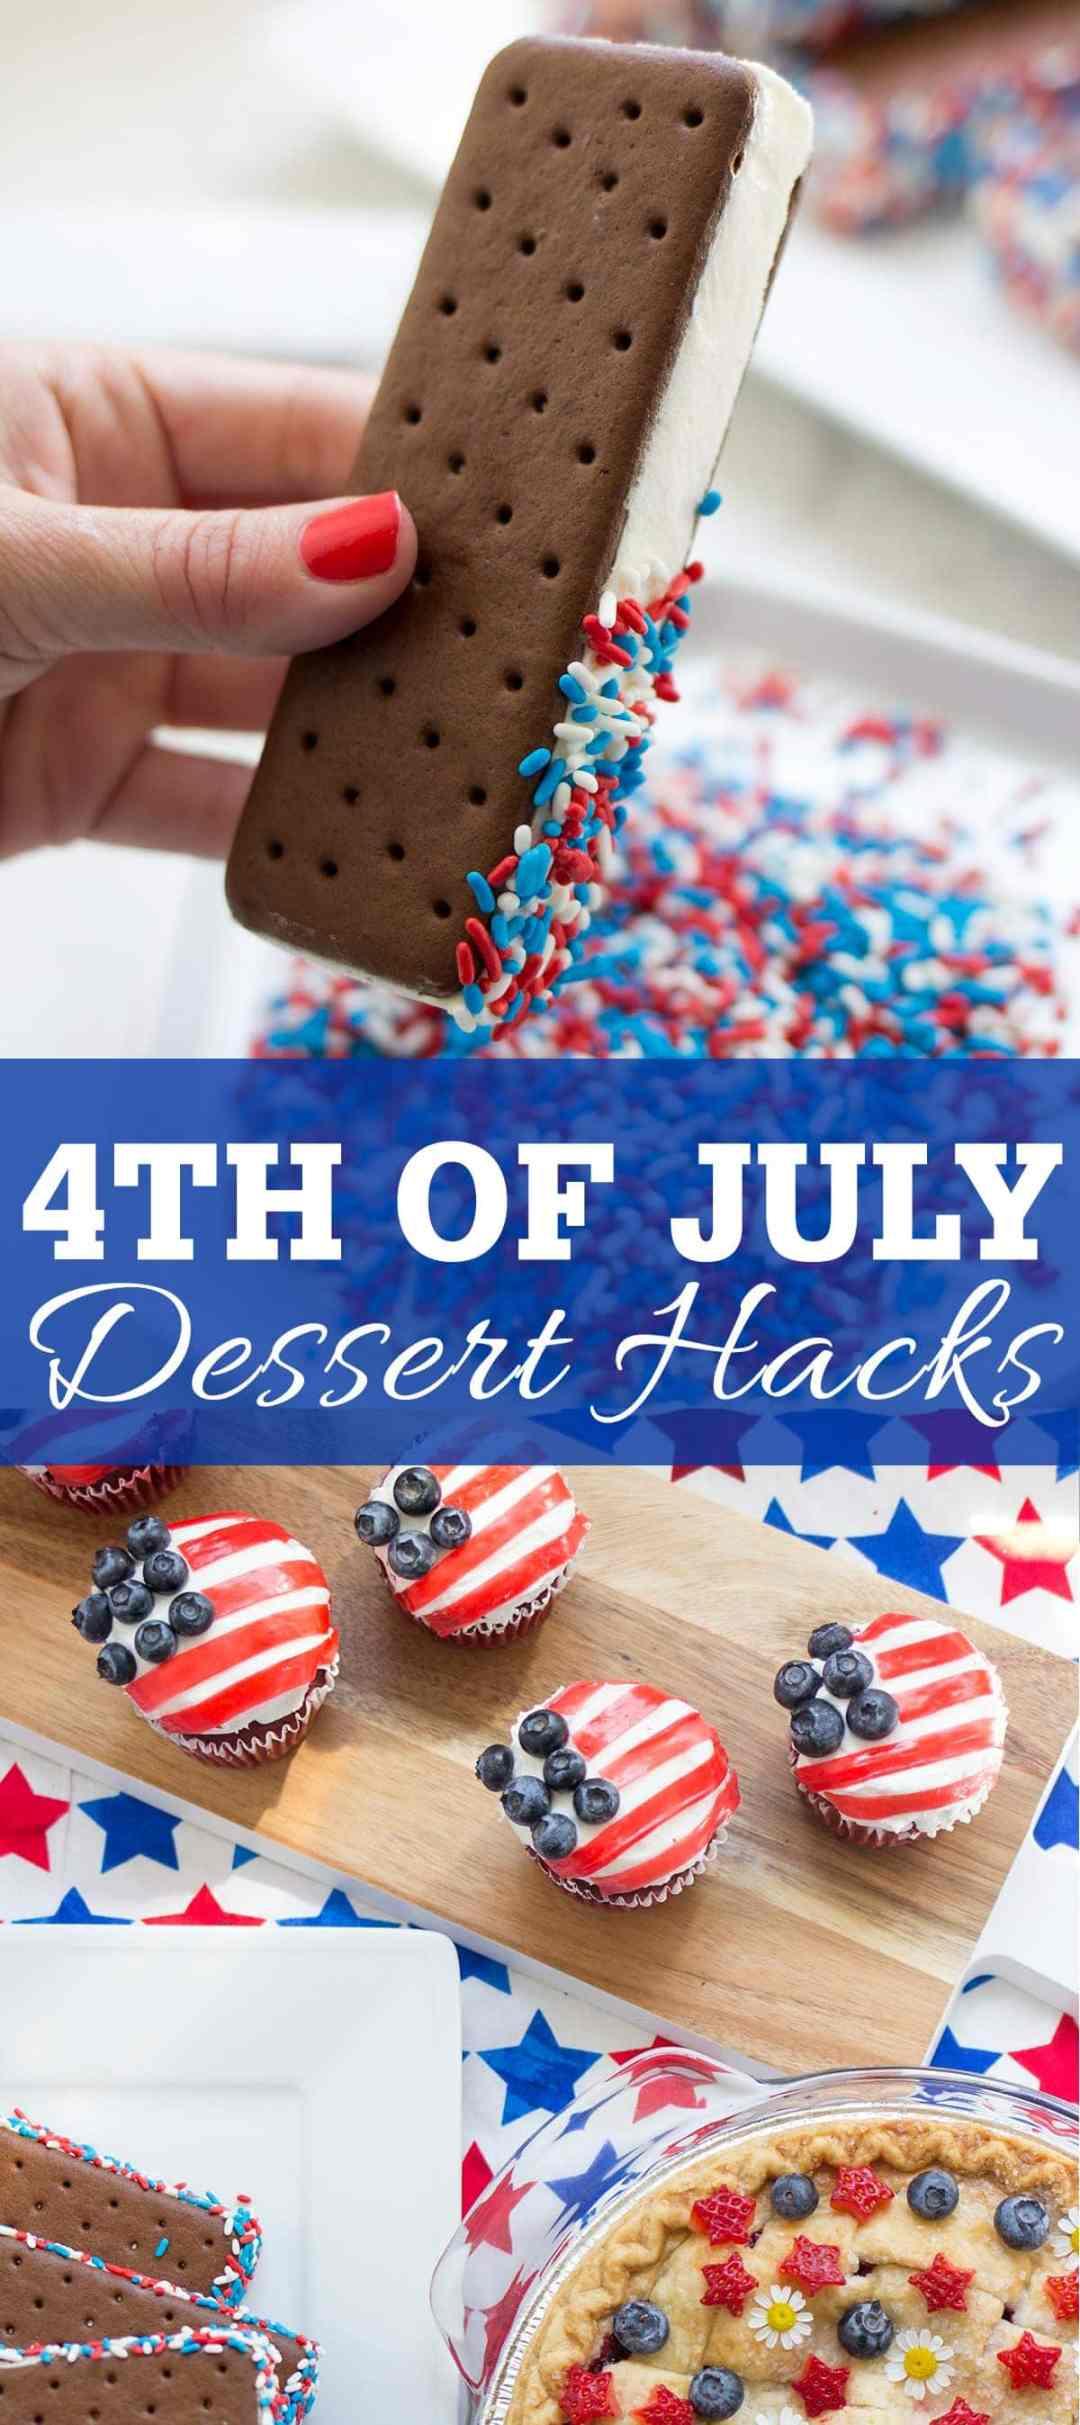 4th of July Dessert Hacks